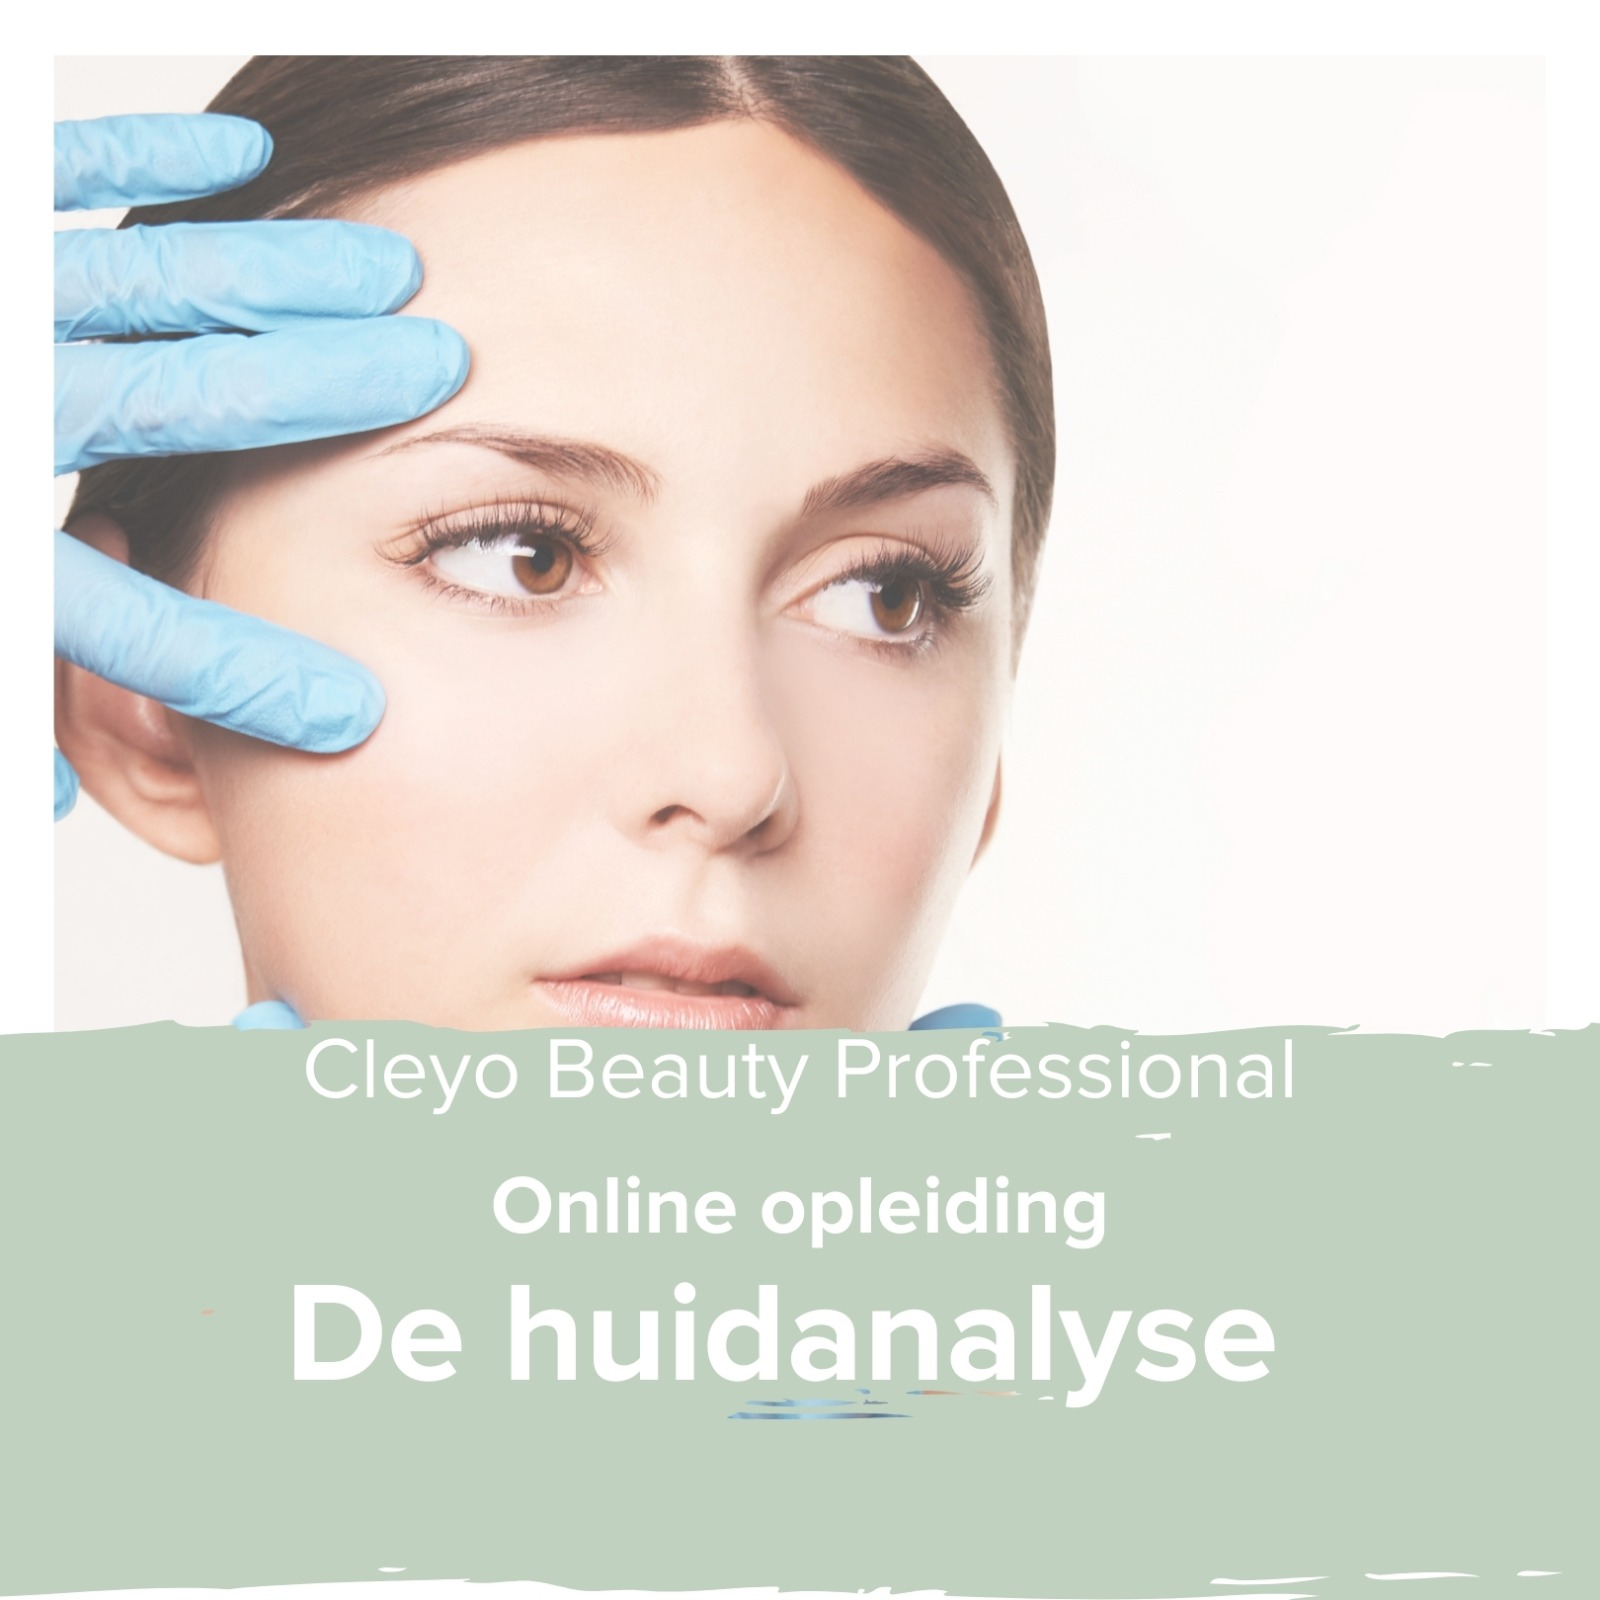 Online opleiding huidanalyse cleyo beauty professional